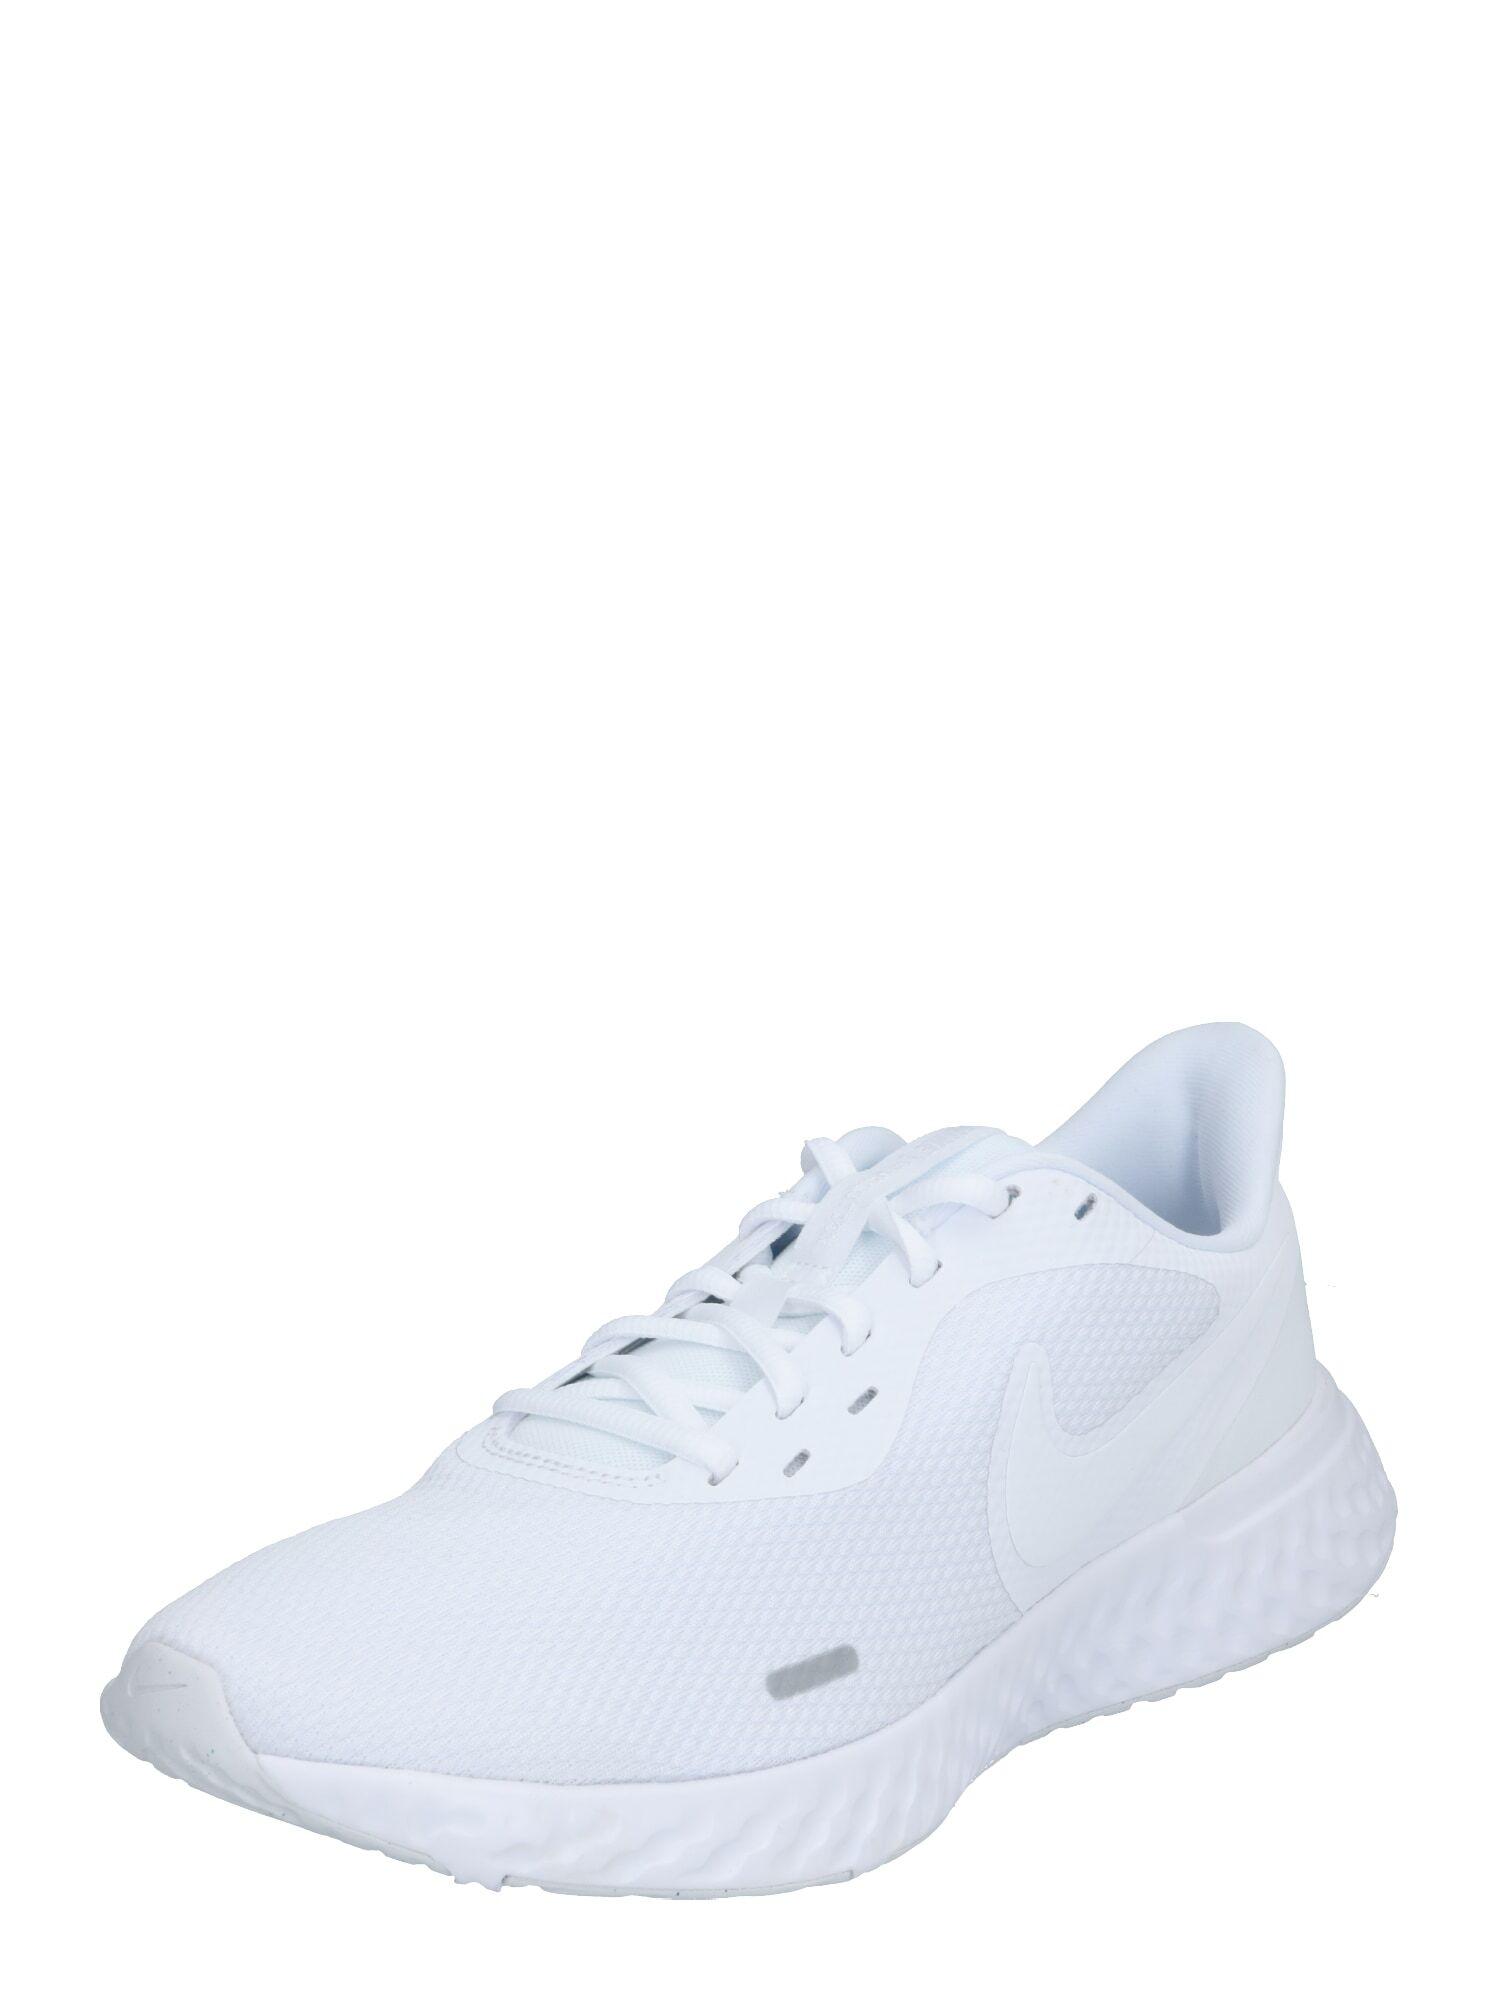 NIKE Chaussure de course 'Revolution 5'  - Blanc - Taille: 9 - male